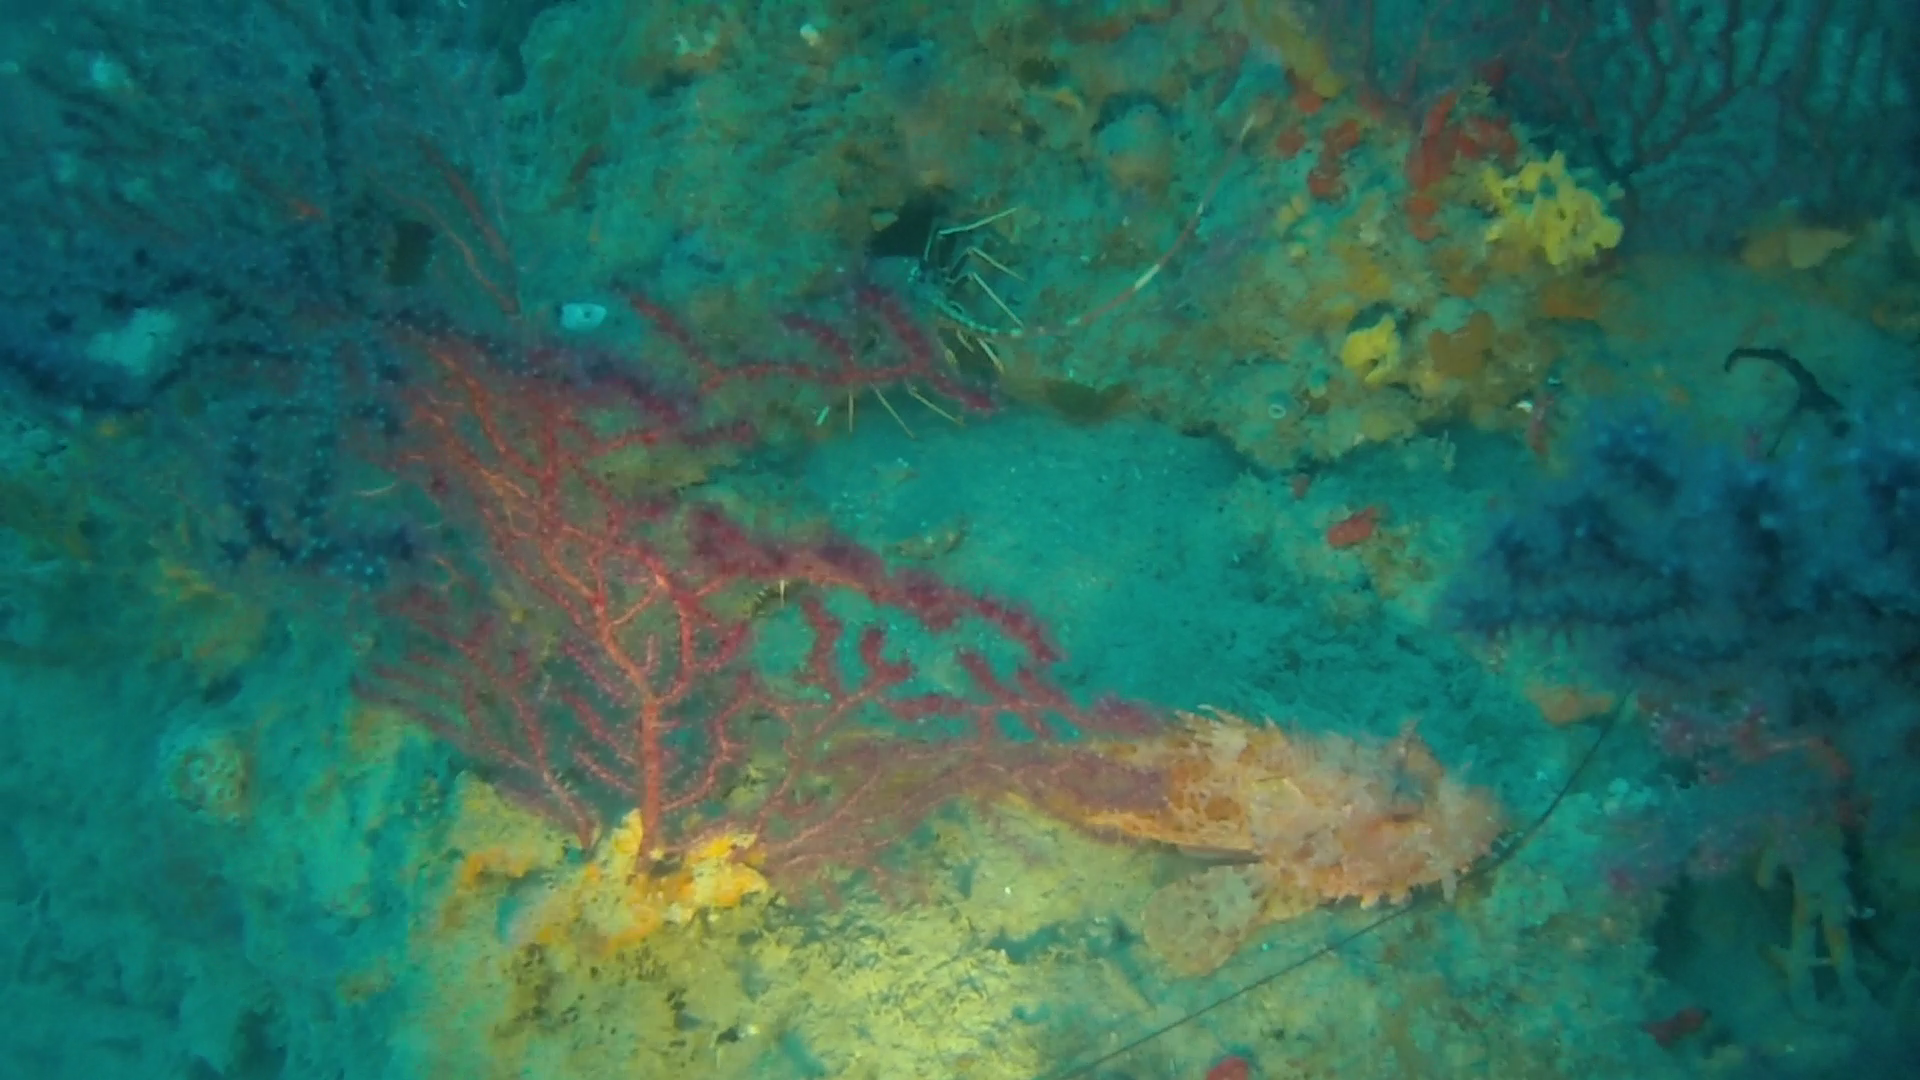 Scorpaena scrofa